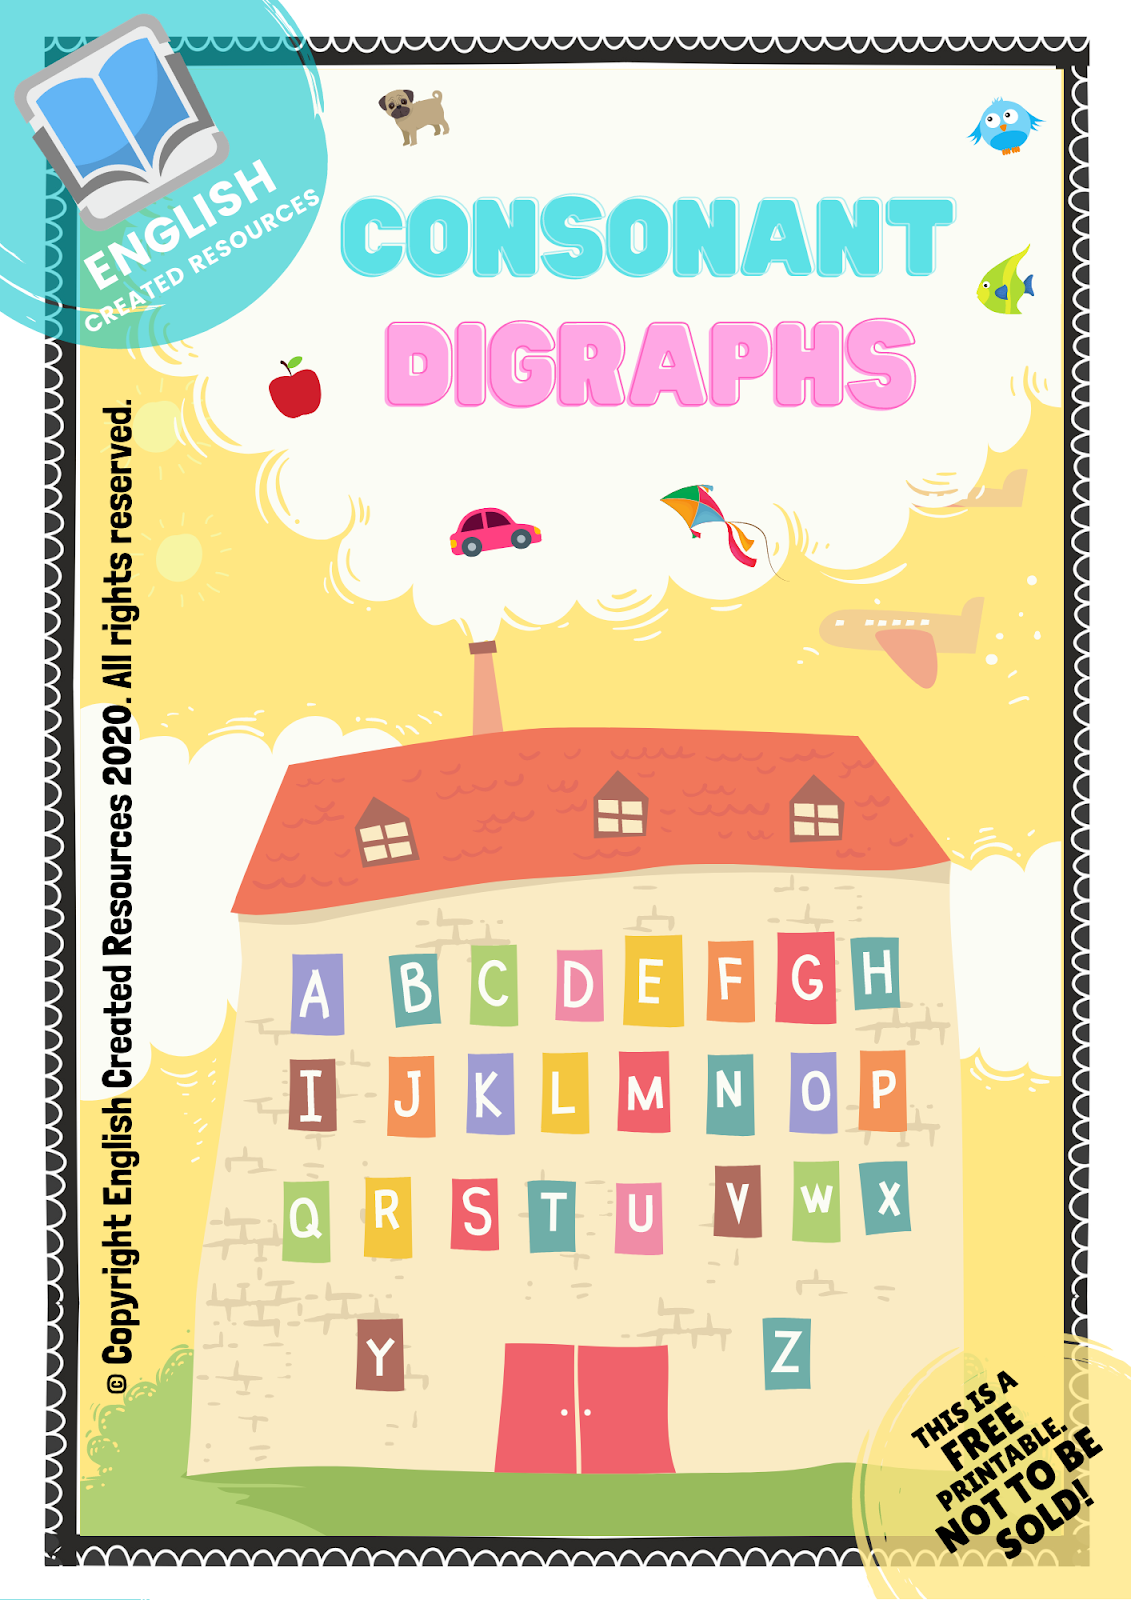 Consonant Digraphs Worksheets